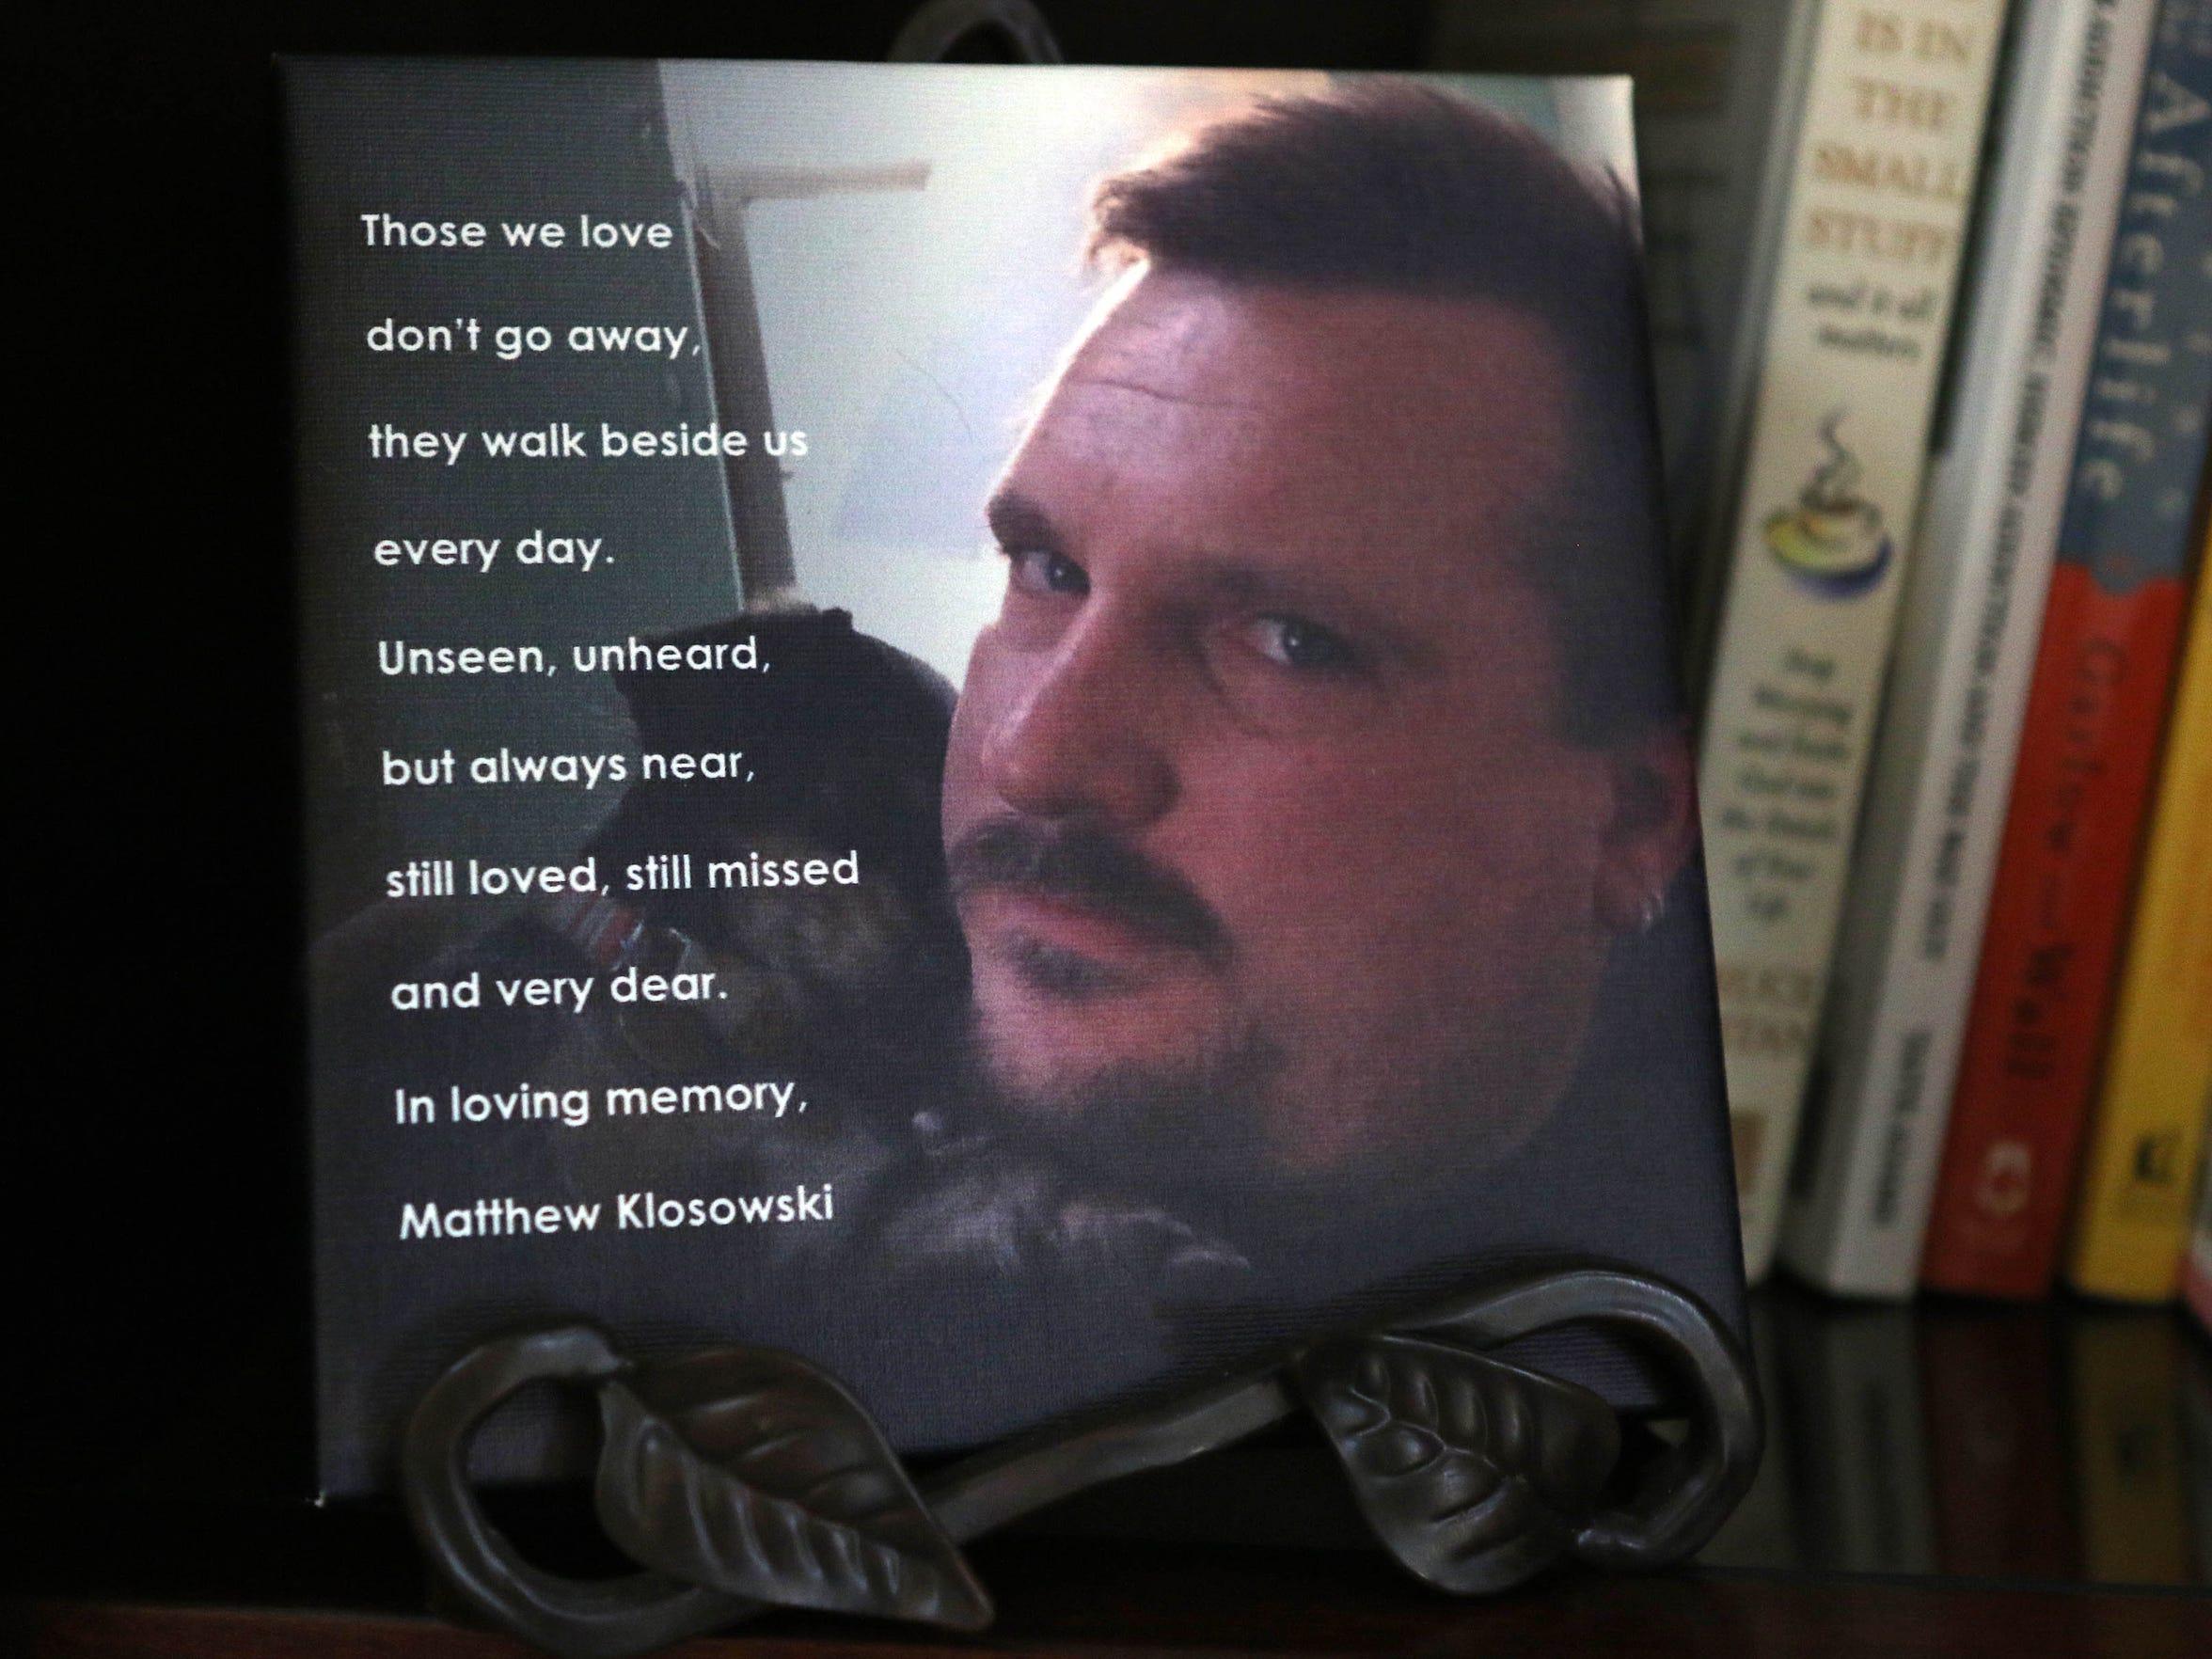 Matt Klosowski overdosed from opiate drugs in January 2015 at age 37.